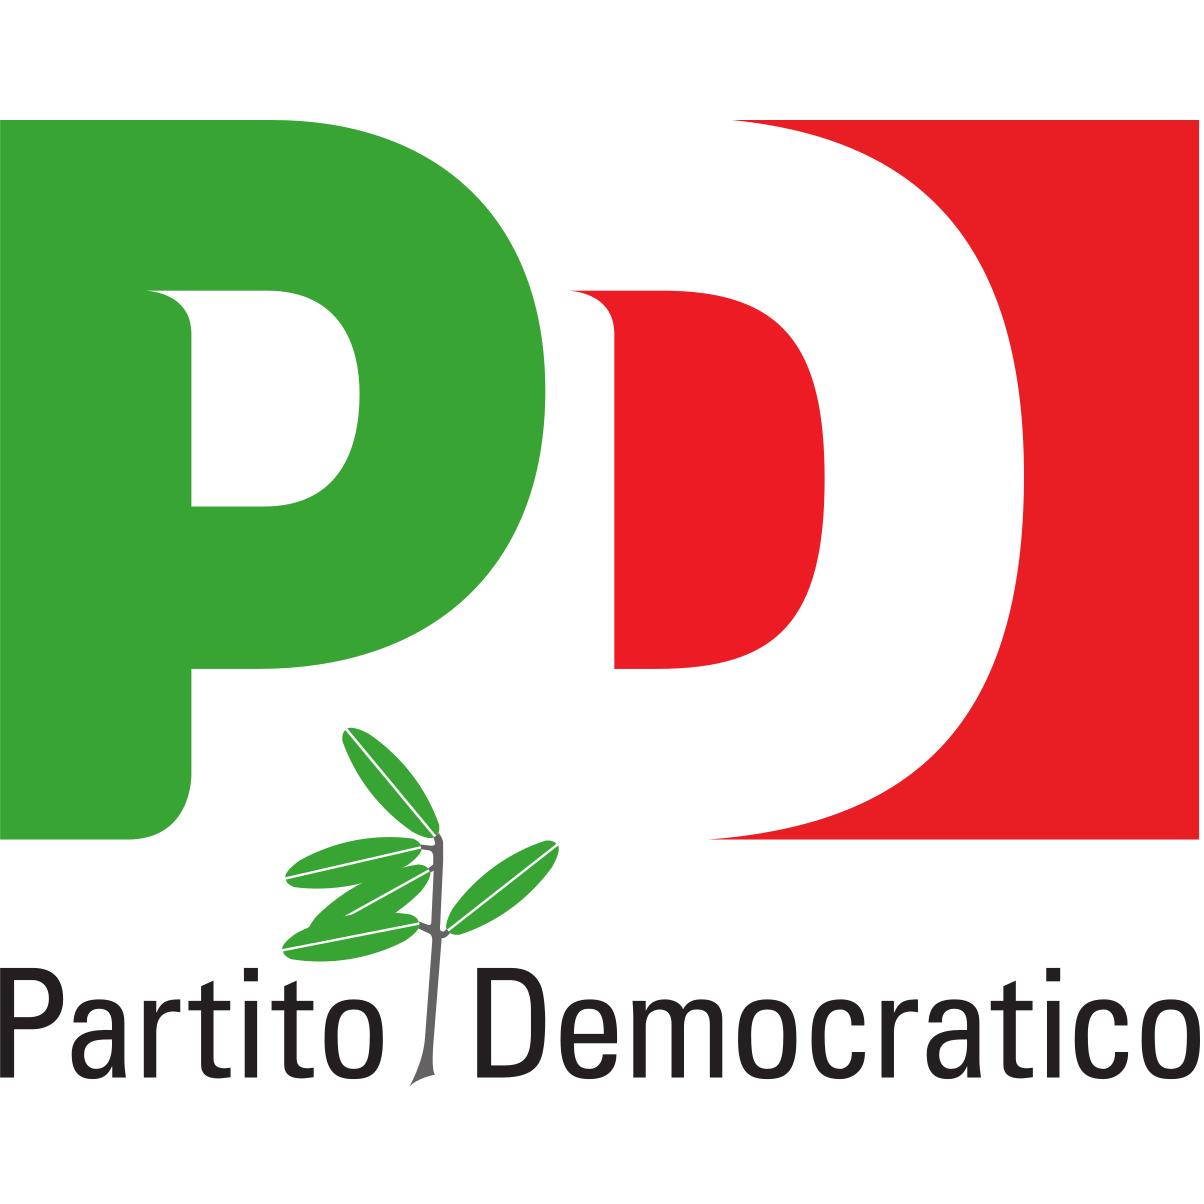 partito democratco